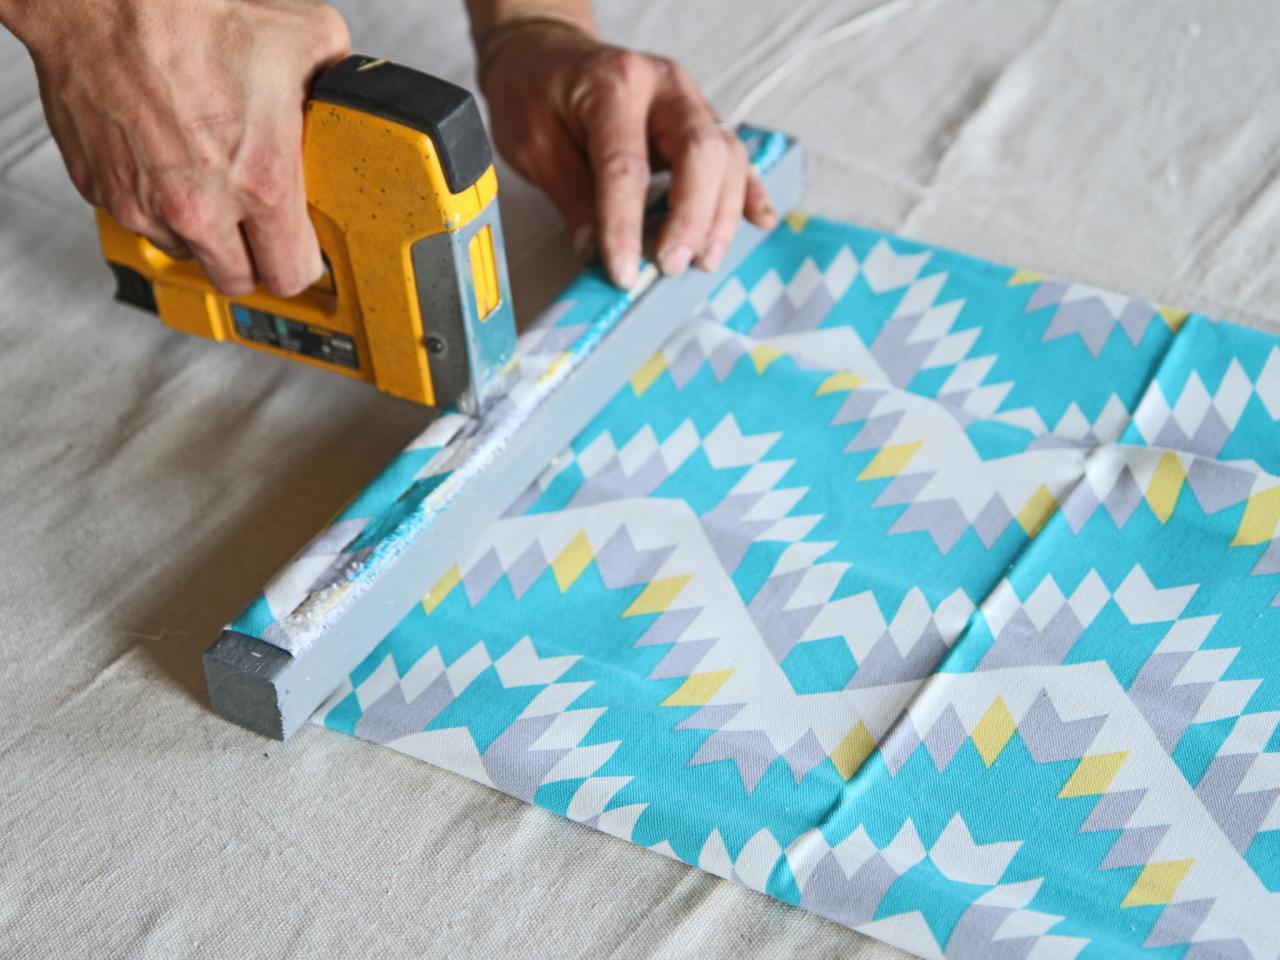 How To Make A Folding Chair Danmade Watch Dan Faires